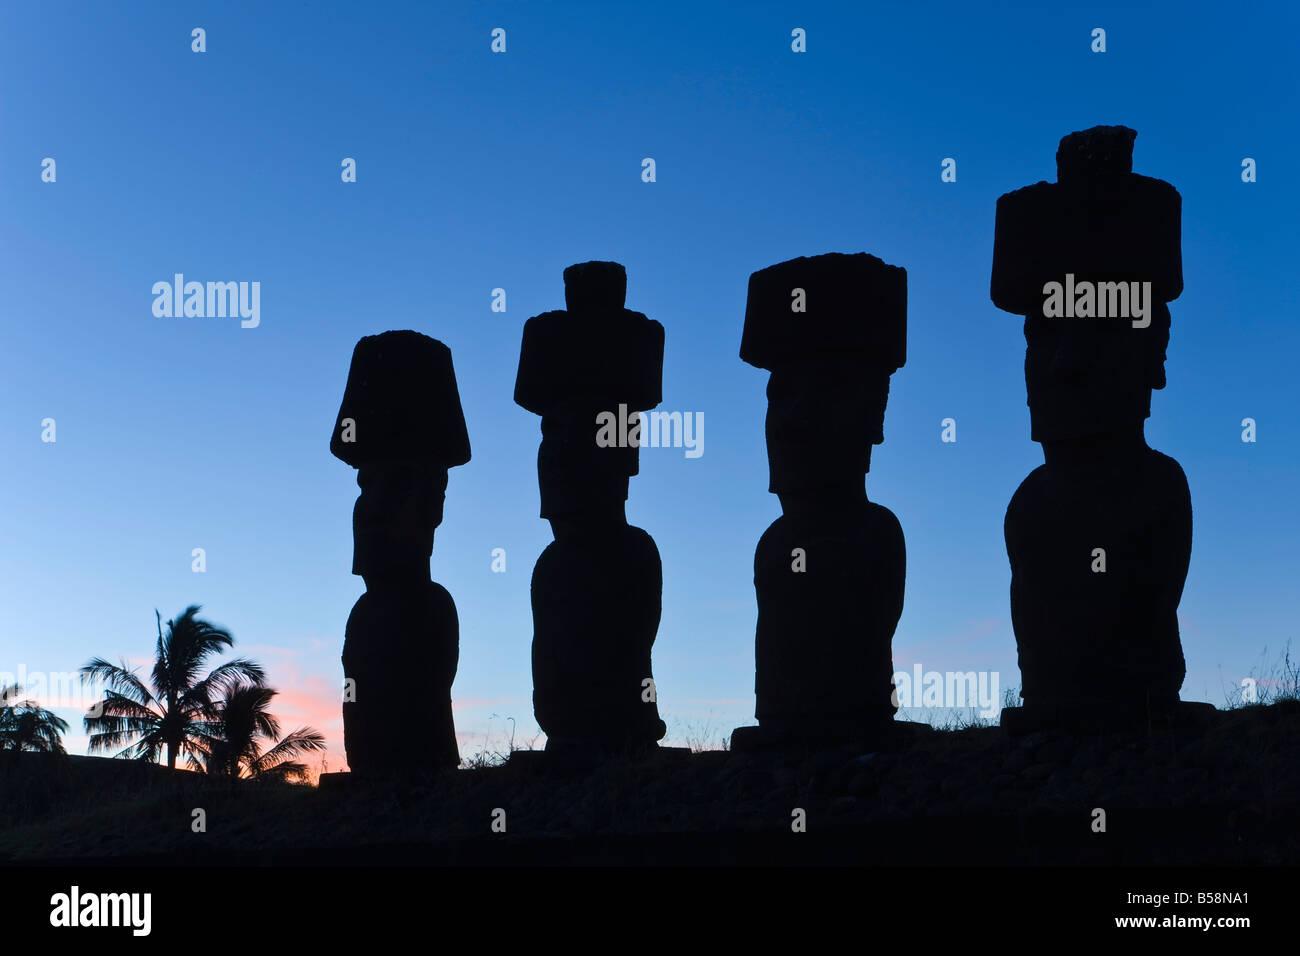 Anakena beach, Moai statues of Ahu Nau Nau, four of which have topknots, Rapa Nui, Chile - Stock Image